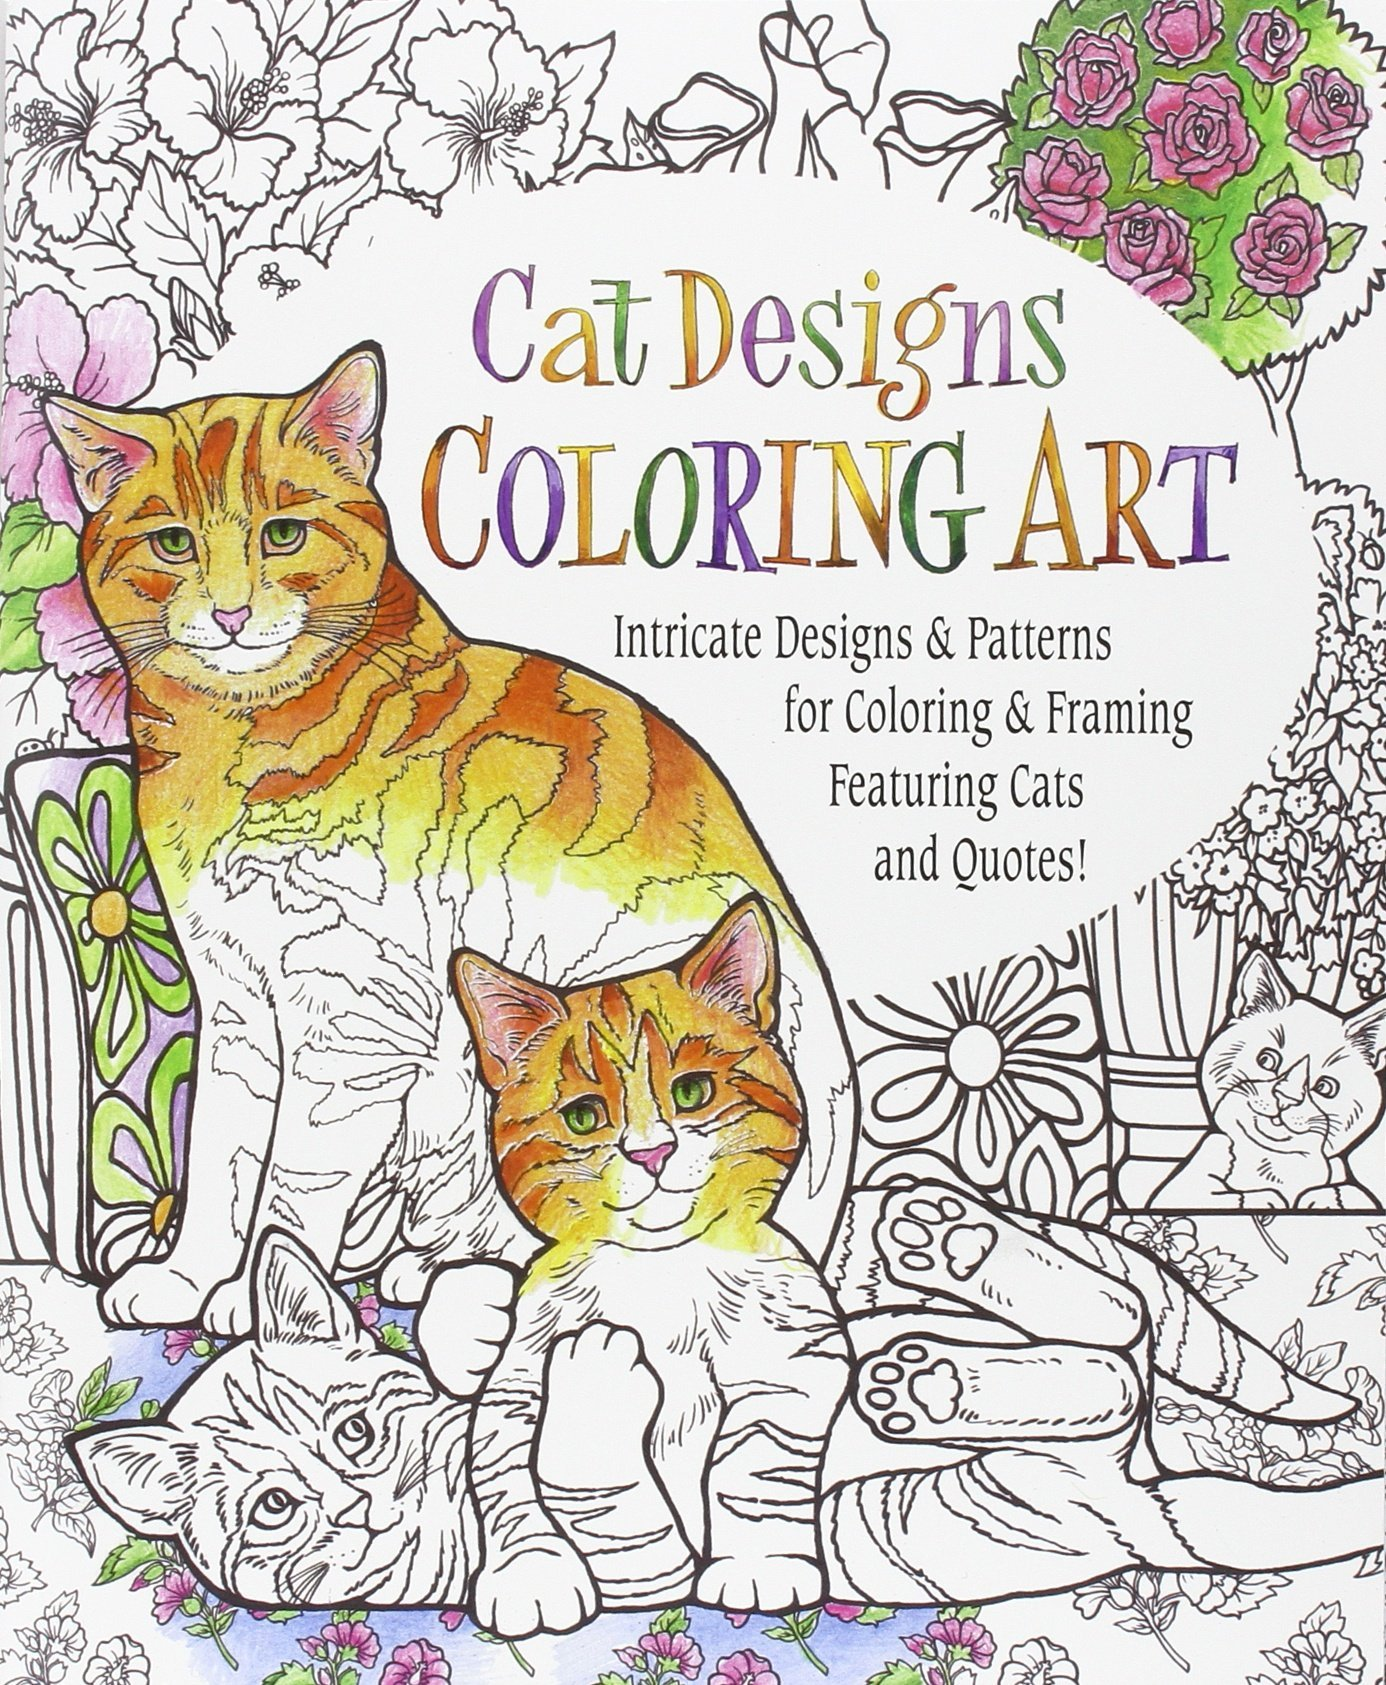 Amazon Cat Designs Coloring Art 9780996386890 Inc Product Concept Mfg Books